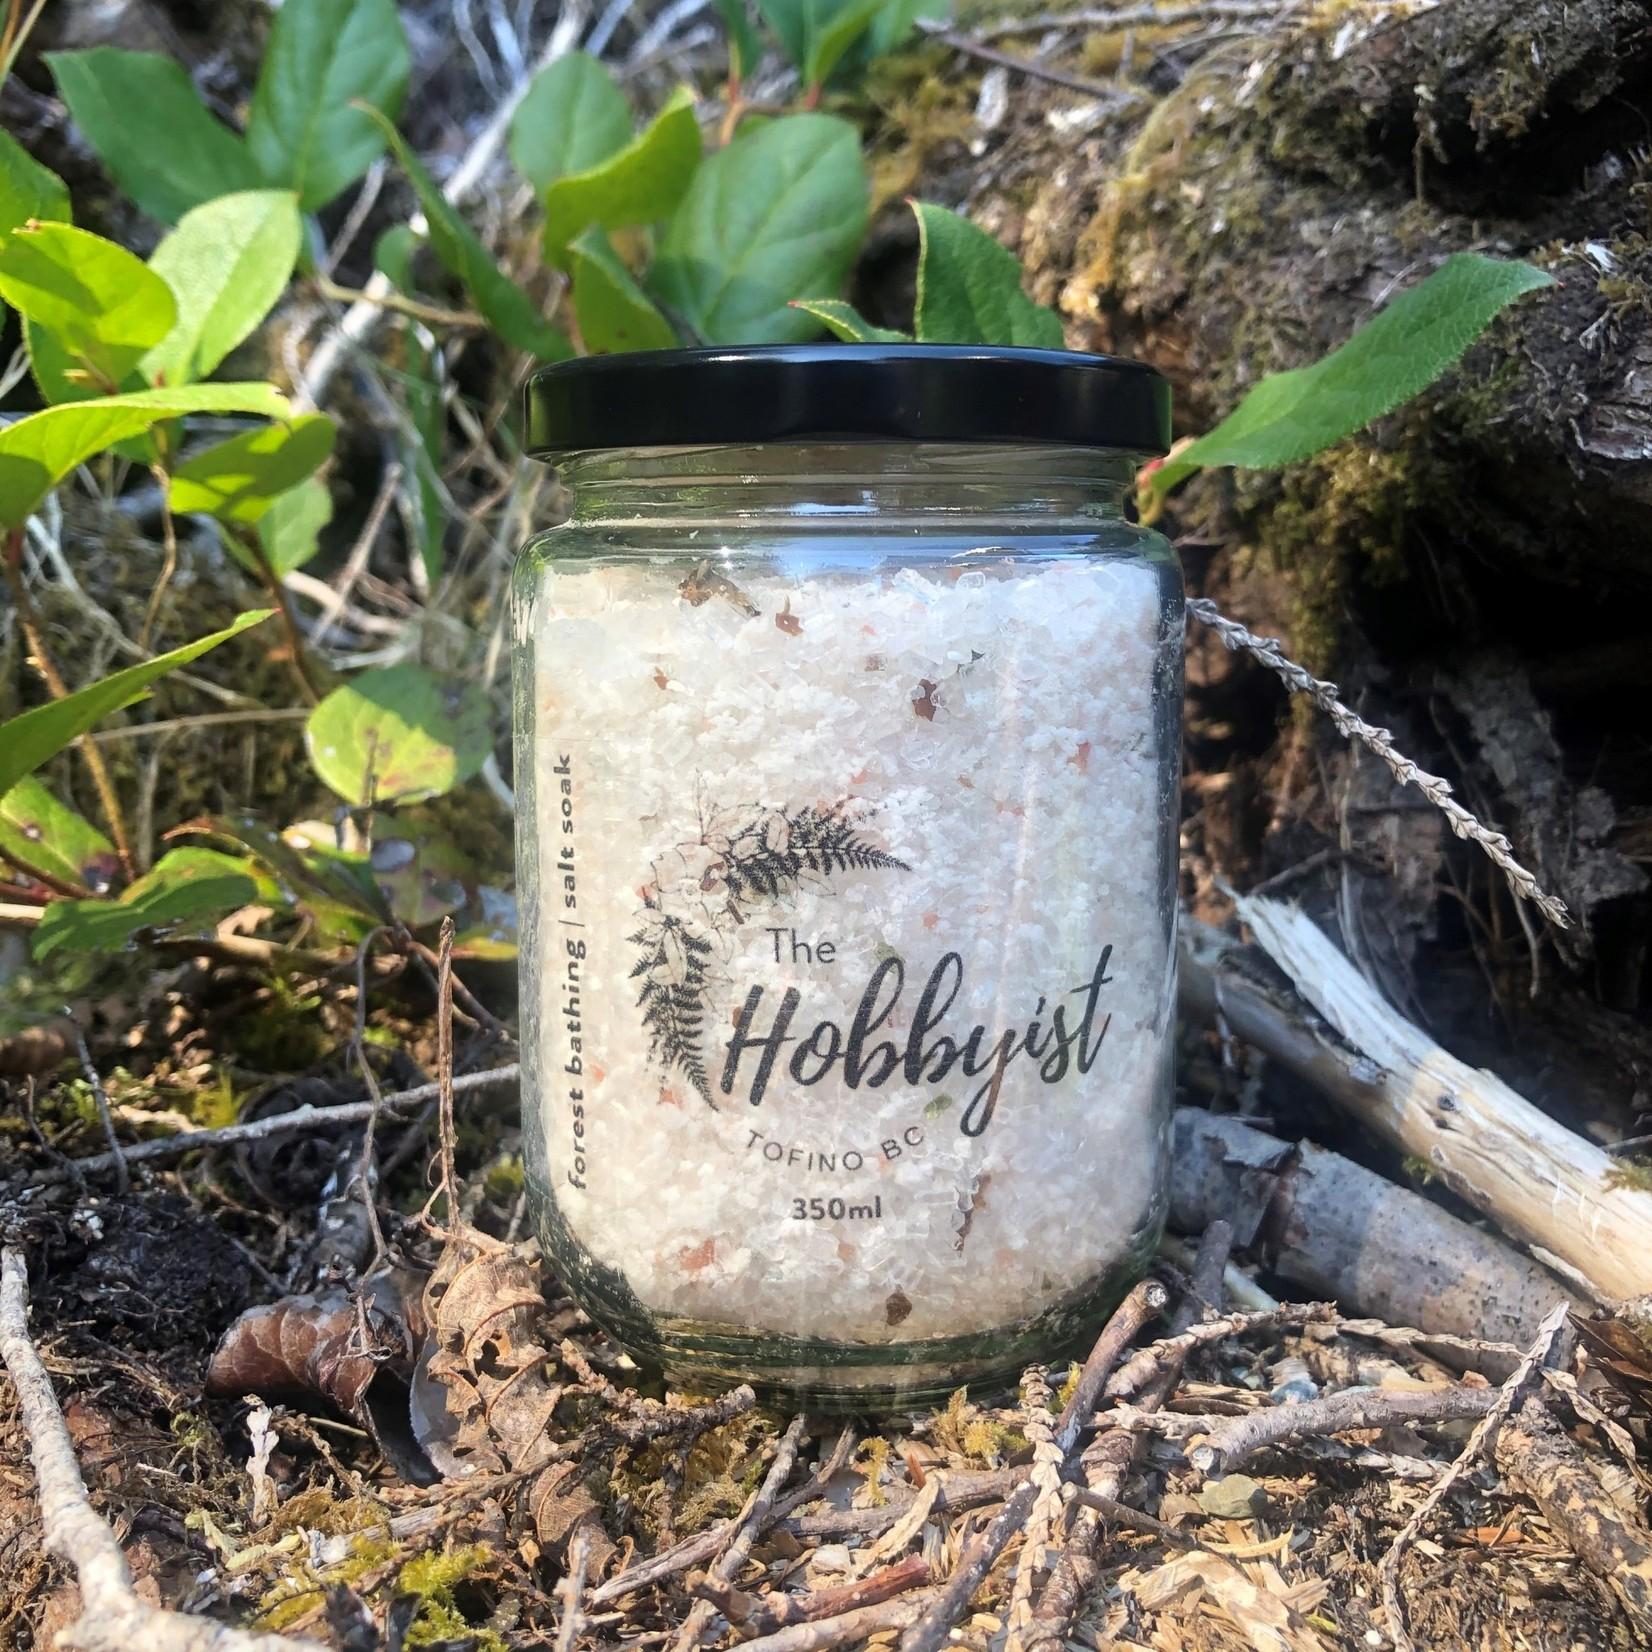 The Hobbyist Forest Bathing Salt Soak